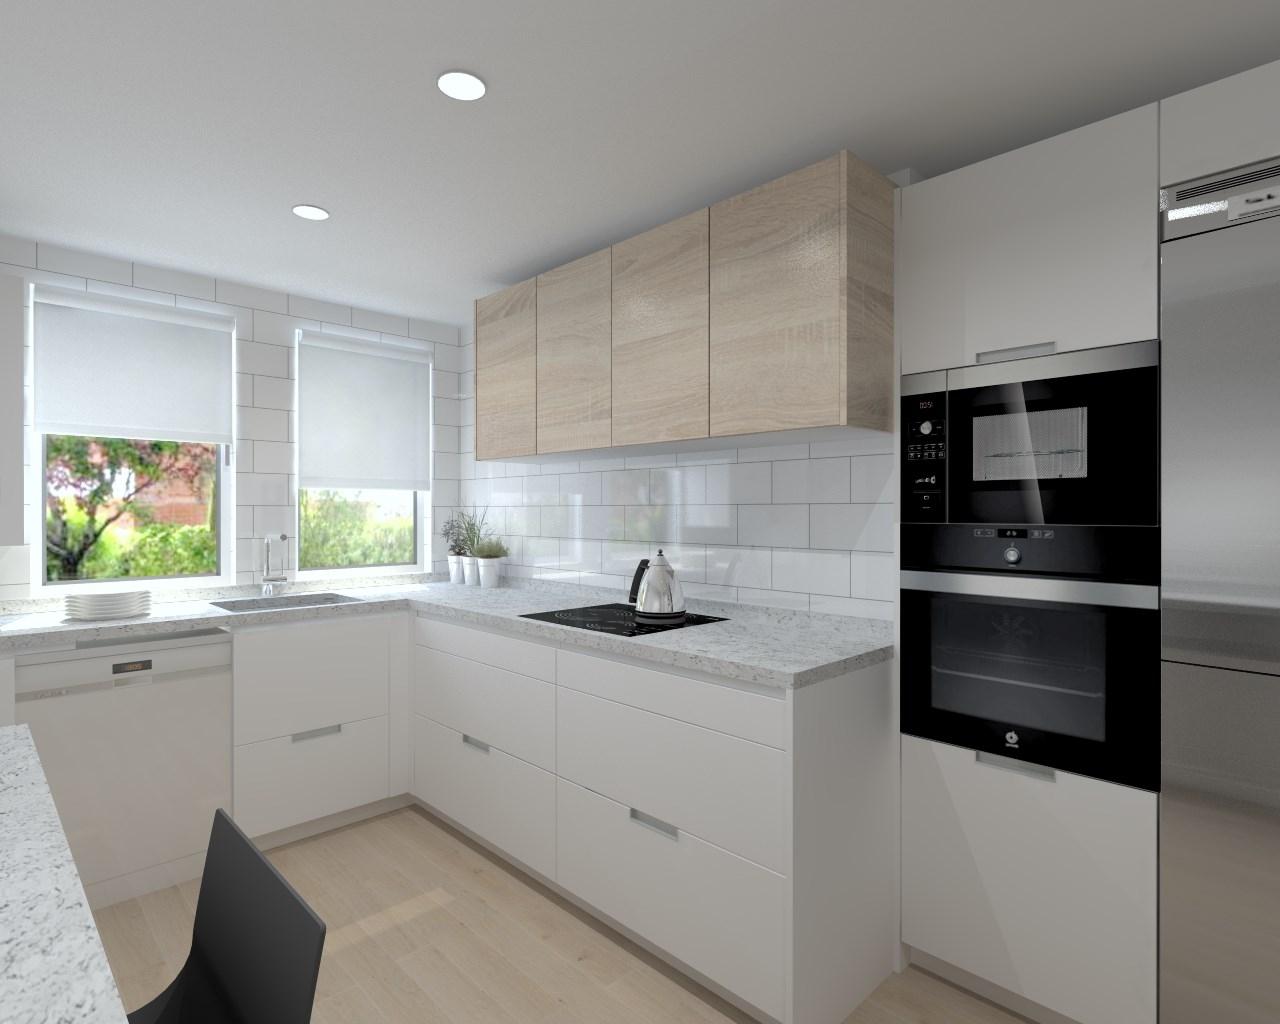 Santos cocinas precios dise os arquitect nicos for Muebles para cocina precios